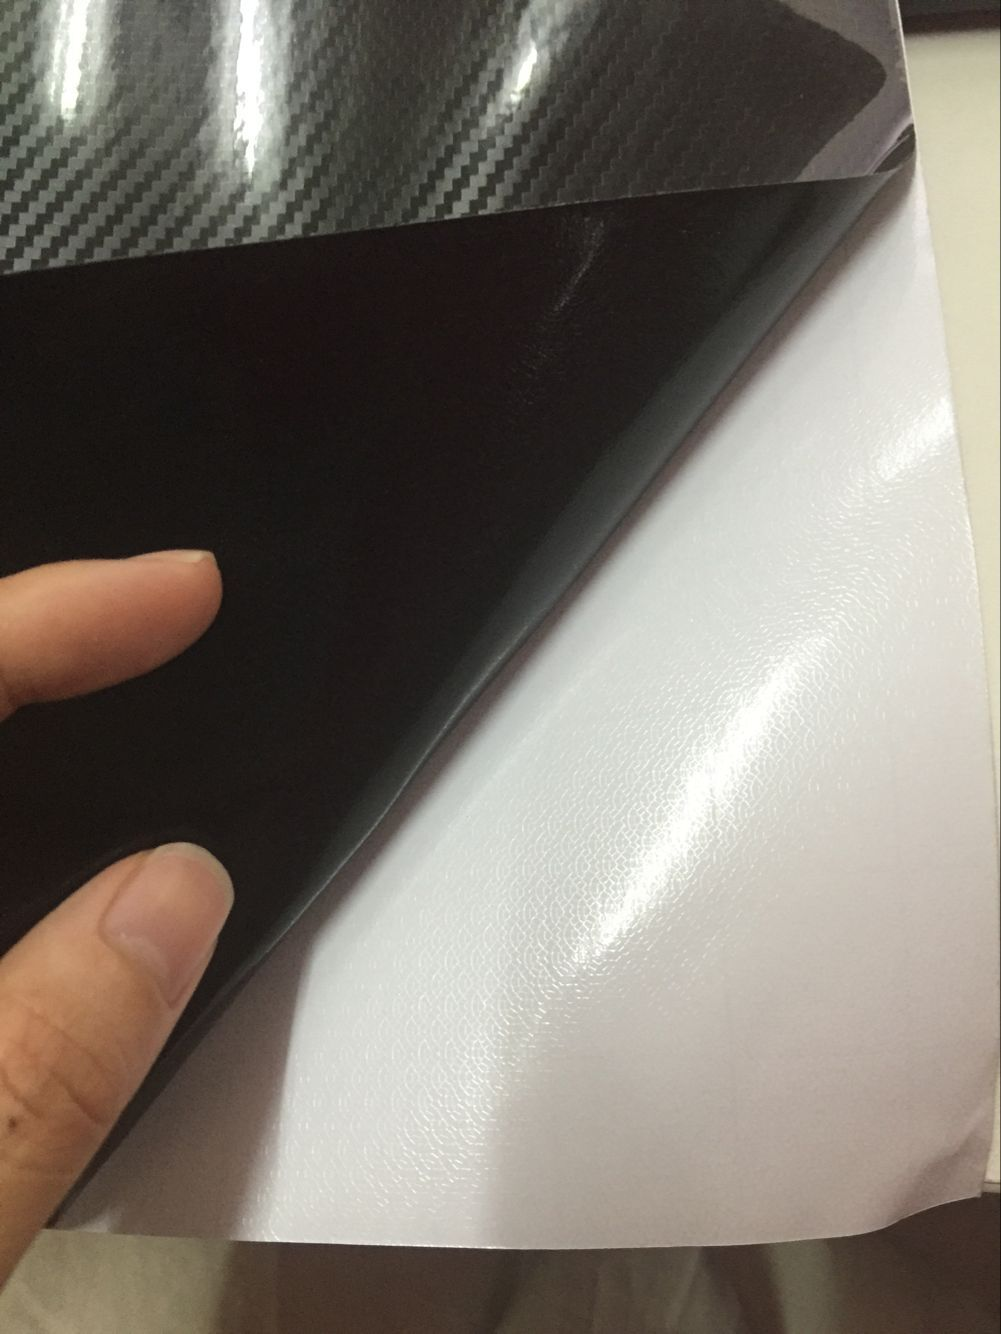 Car Whole Body Sticker Glossy Black 5D Carbon Fiber Vinyl Carbon Fiber Hood Vent